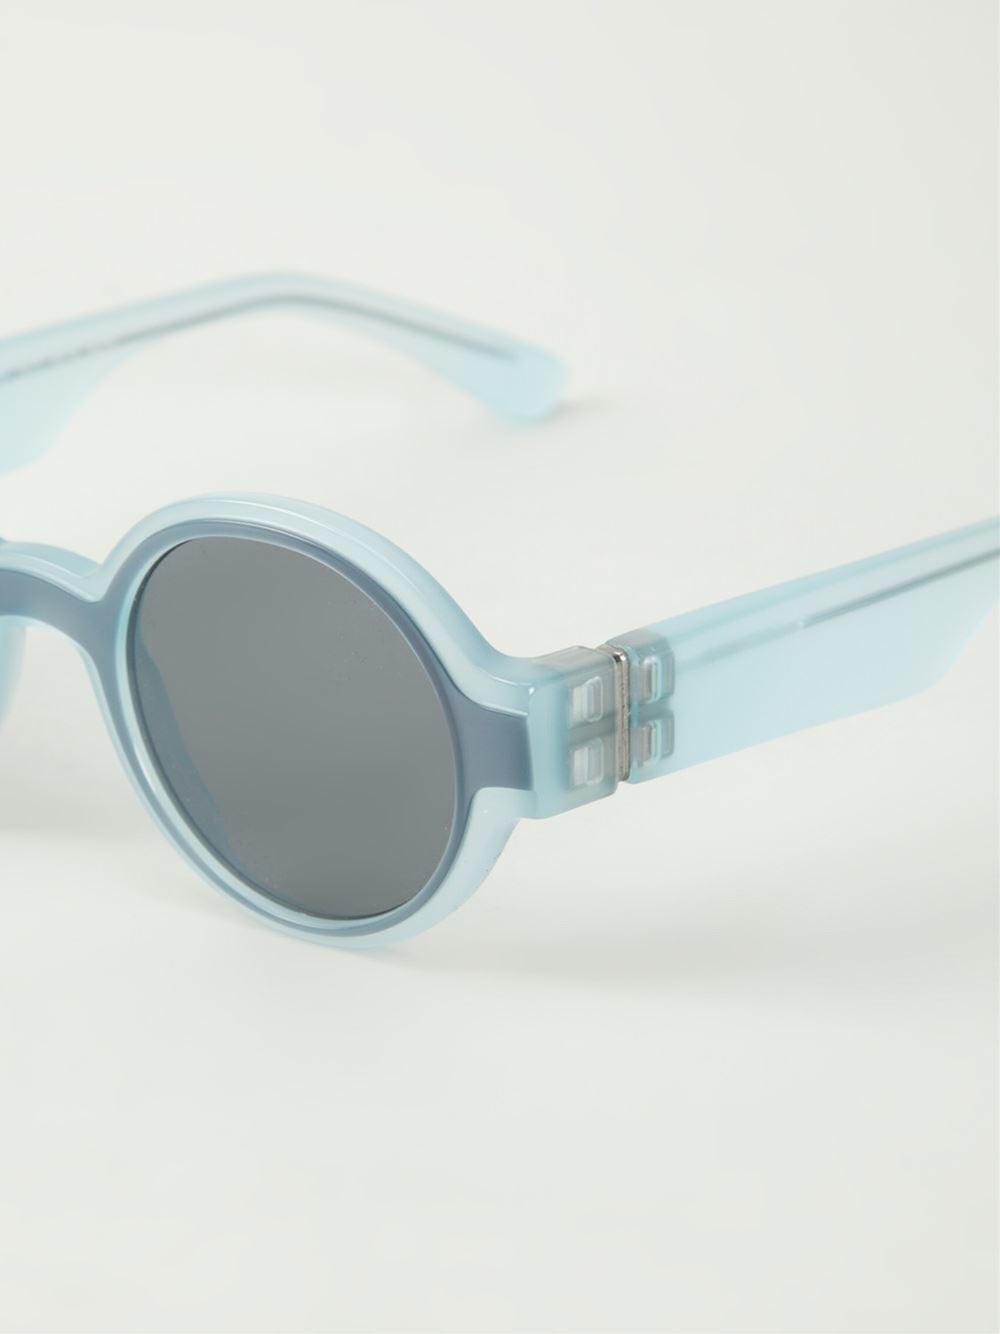 Mykita maison martin margiela x sunglasses in blue lyst for Martin margiela glasses